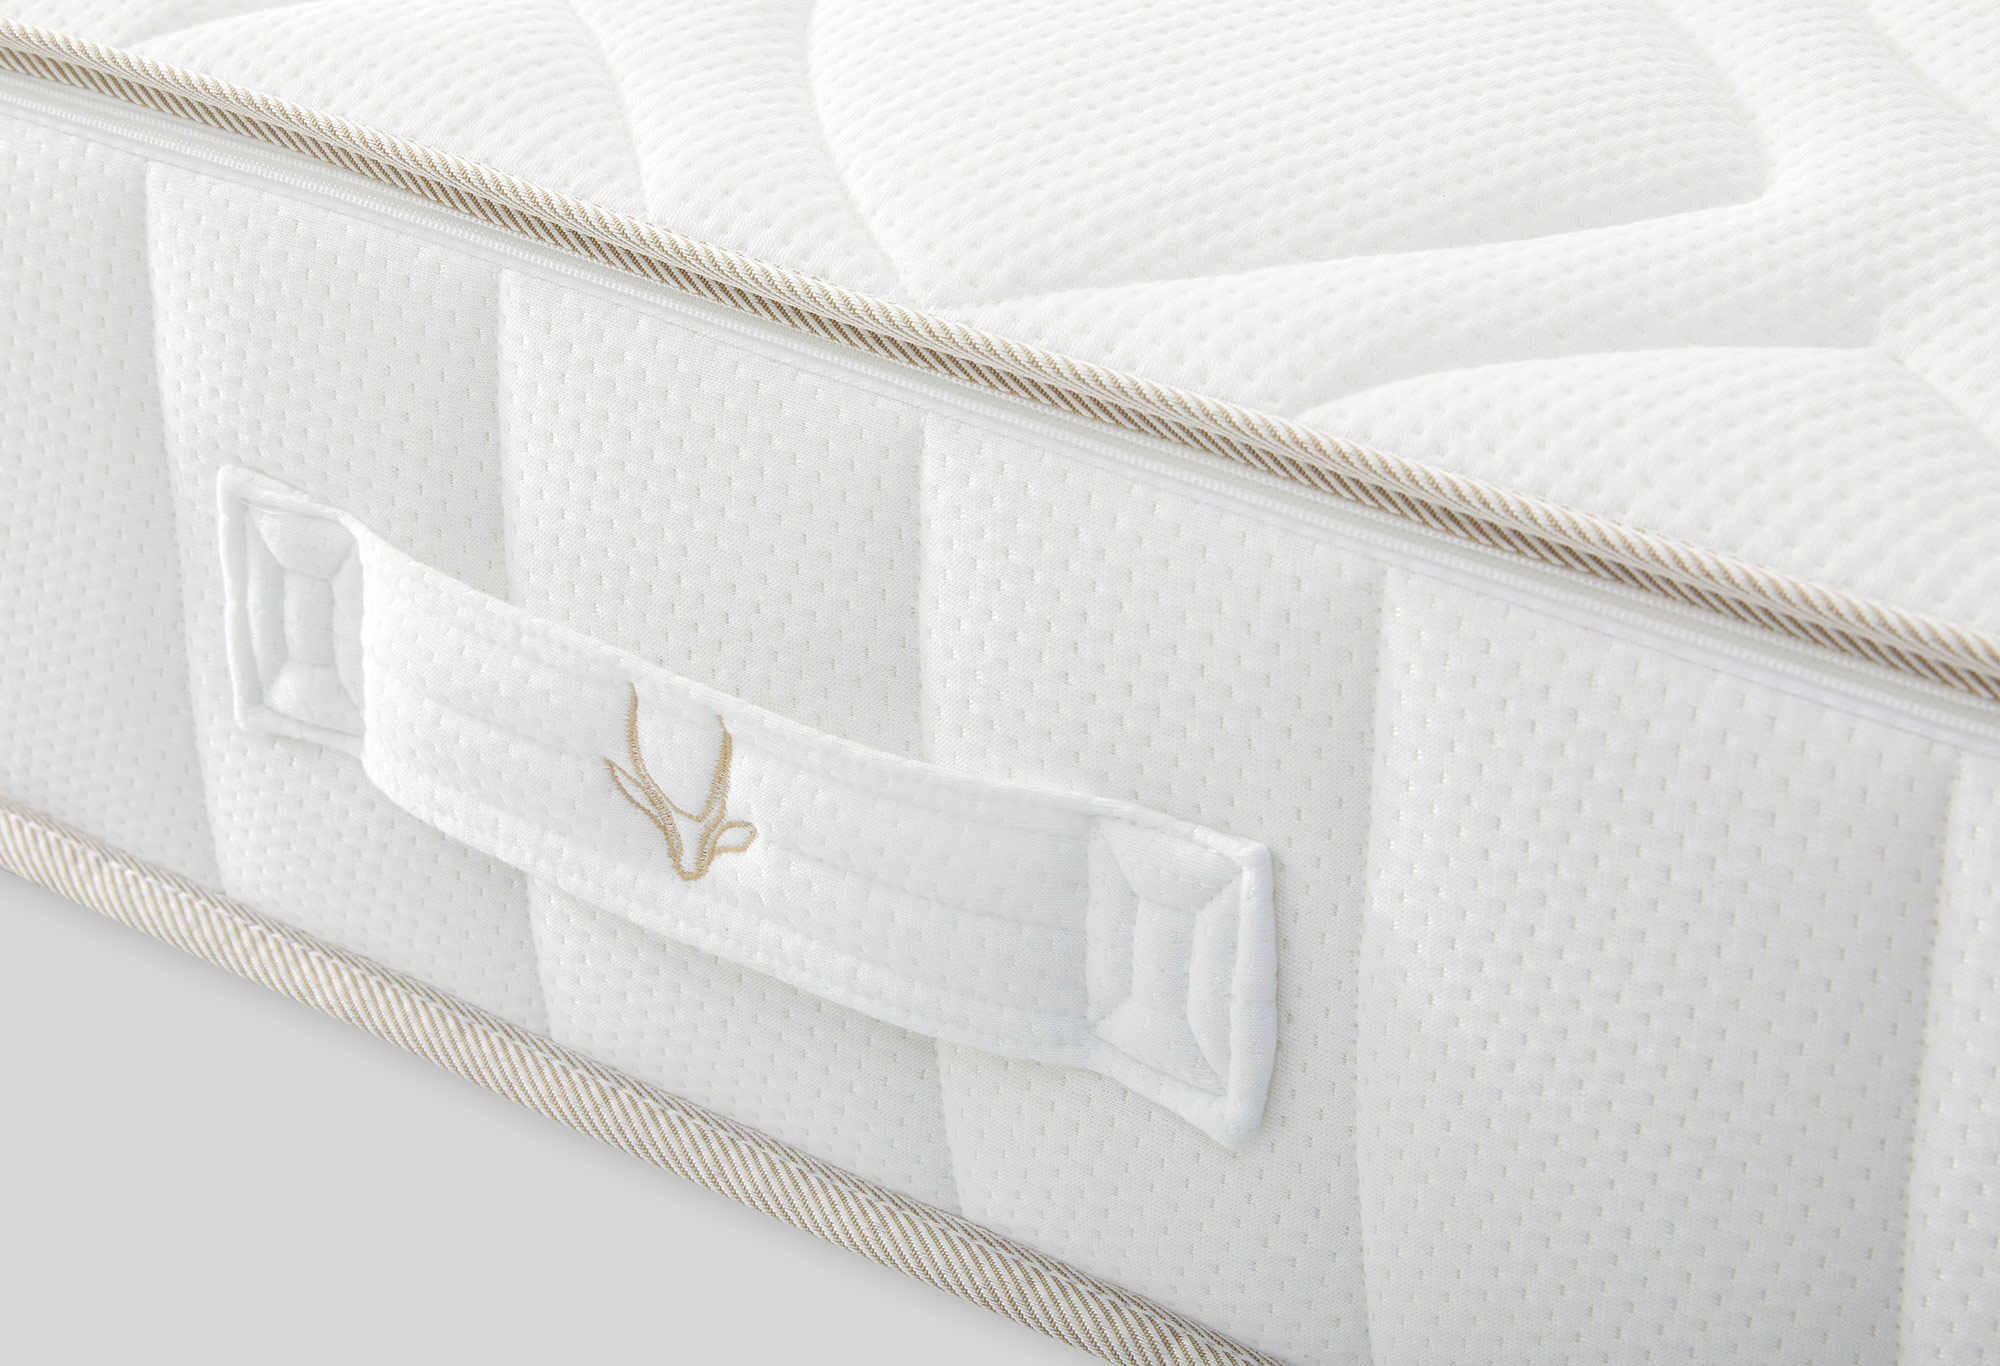 Gazella Comfort II Pocketvering Matras Detail | Swiss Sense